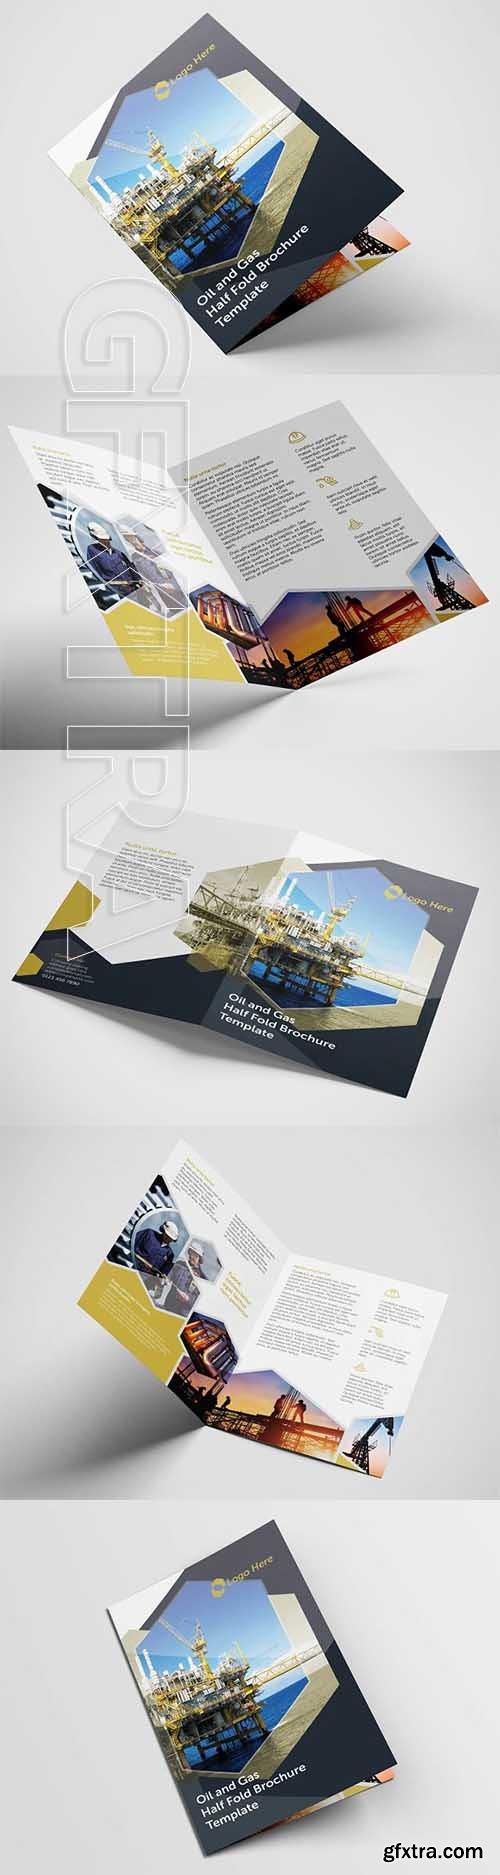 CreativeMarket - Half Fold Oil Gas Brochure Template 2581155